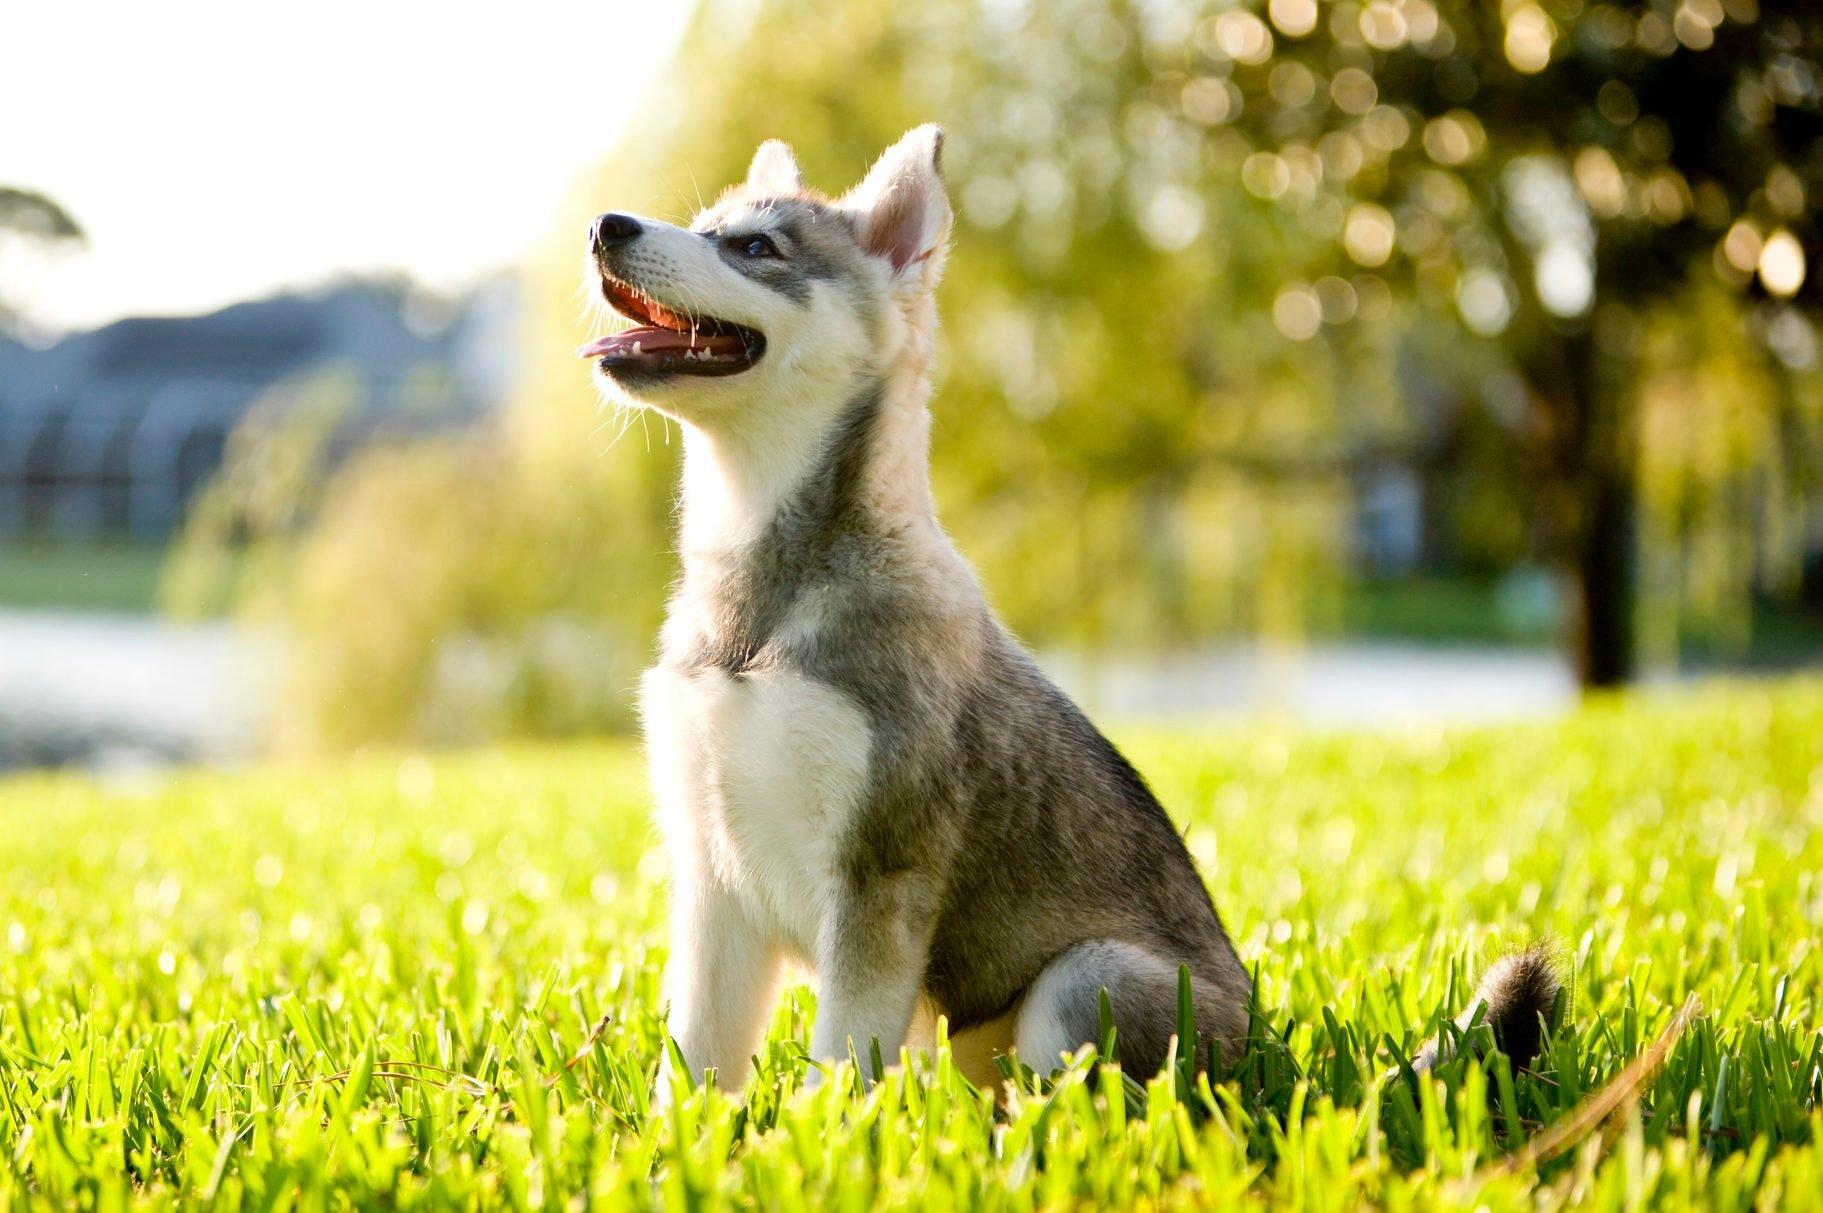 Alaskan Klee Kai puppy sitting on grass looking up